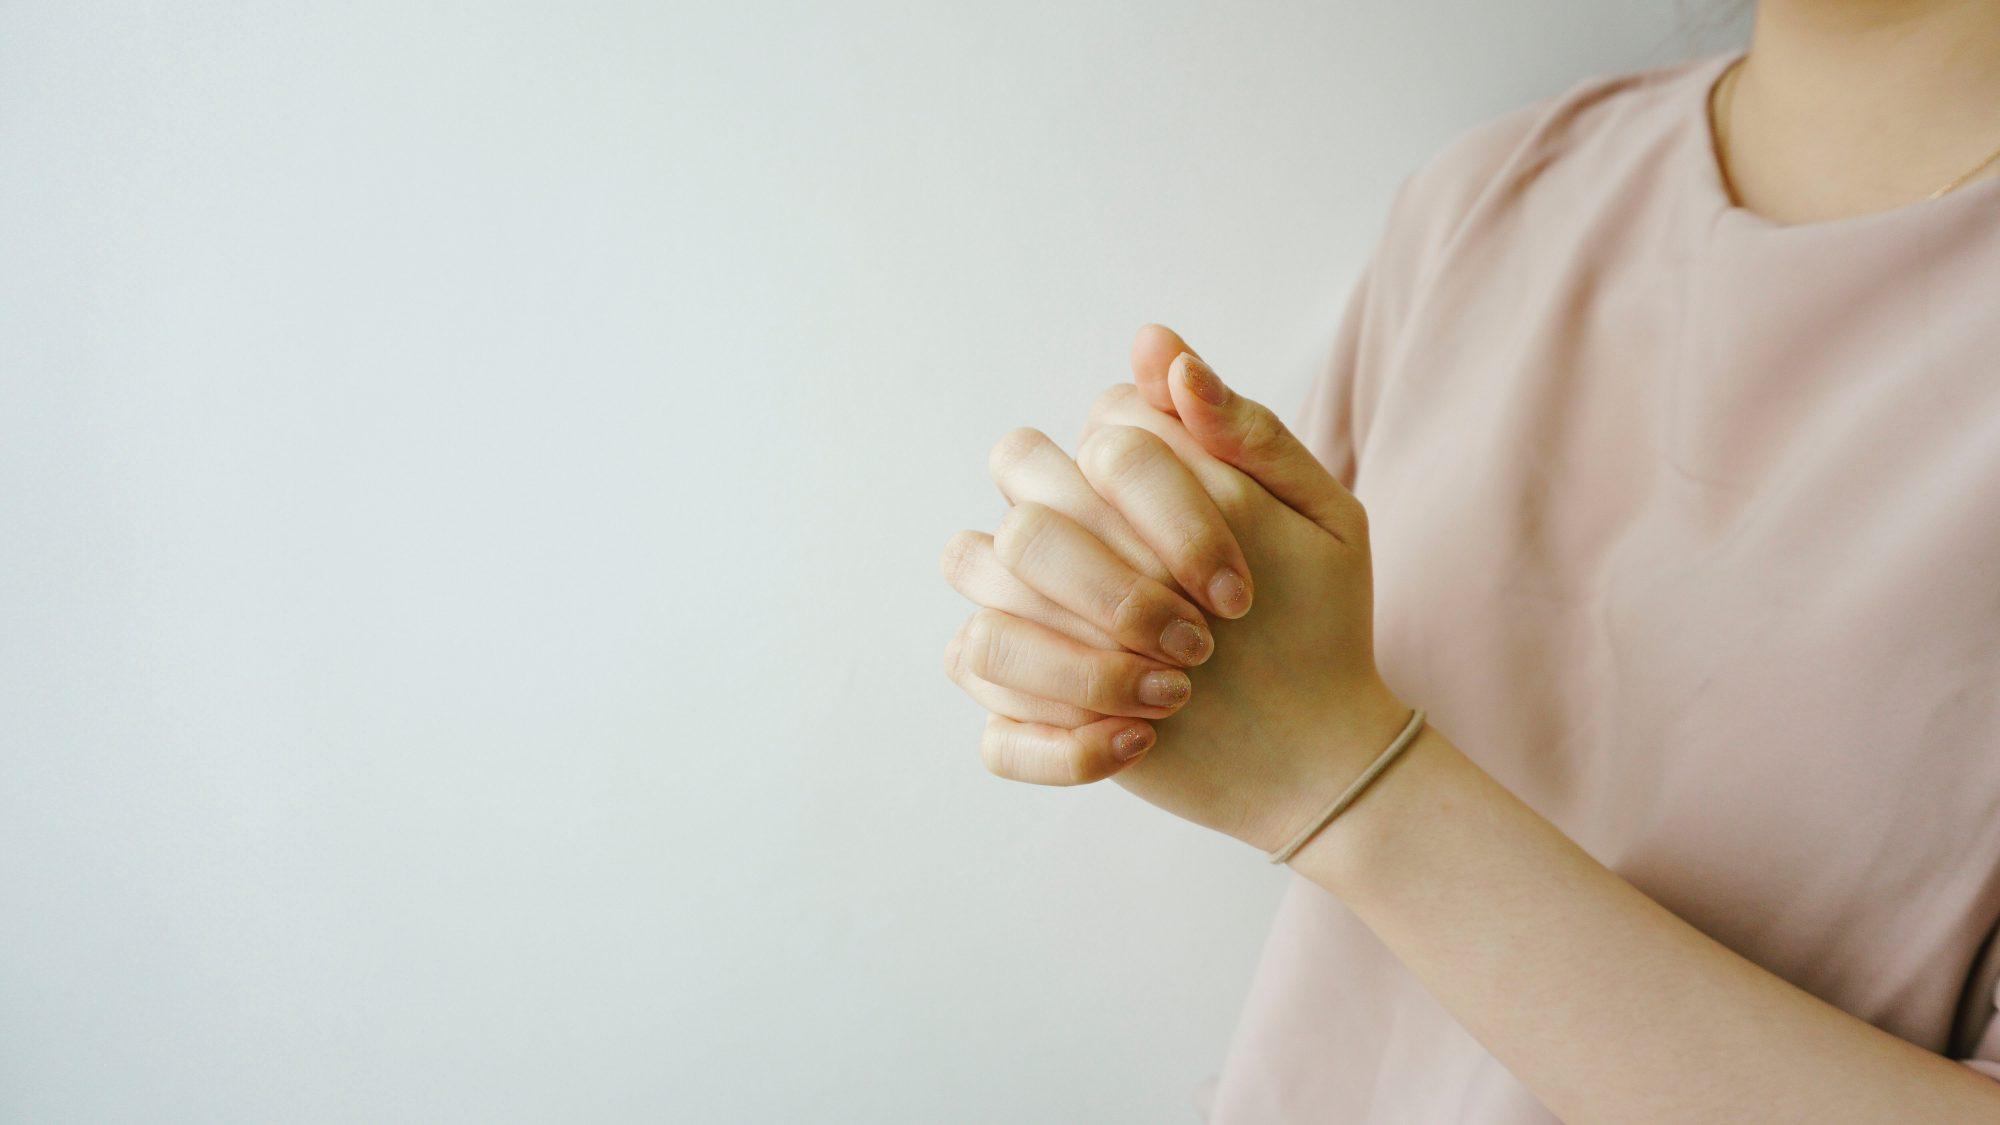 Gebet als Lebenshaltung